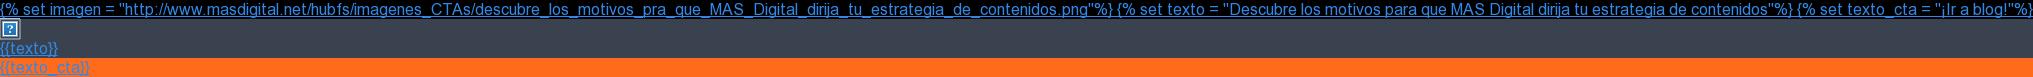 texto_cta=